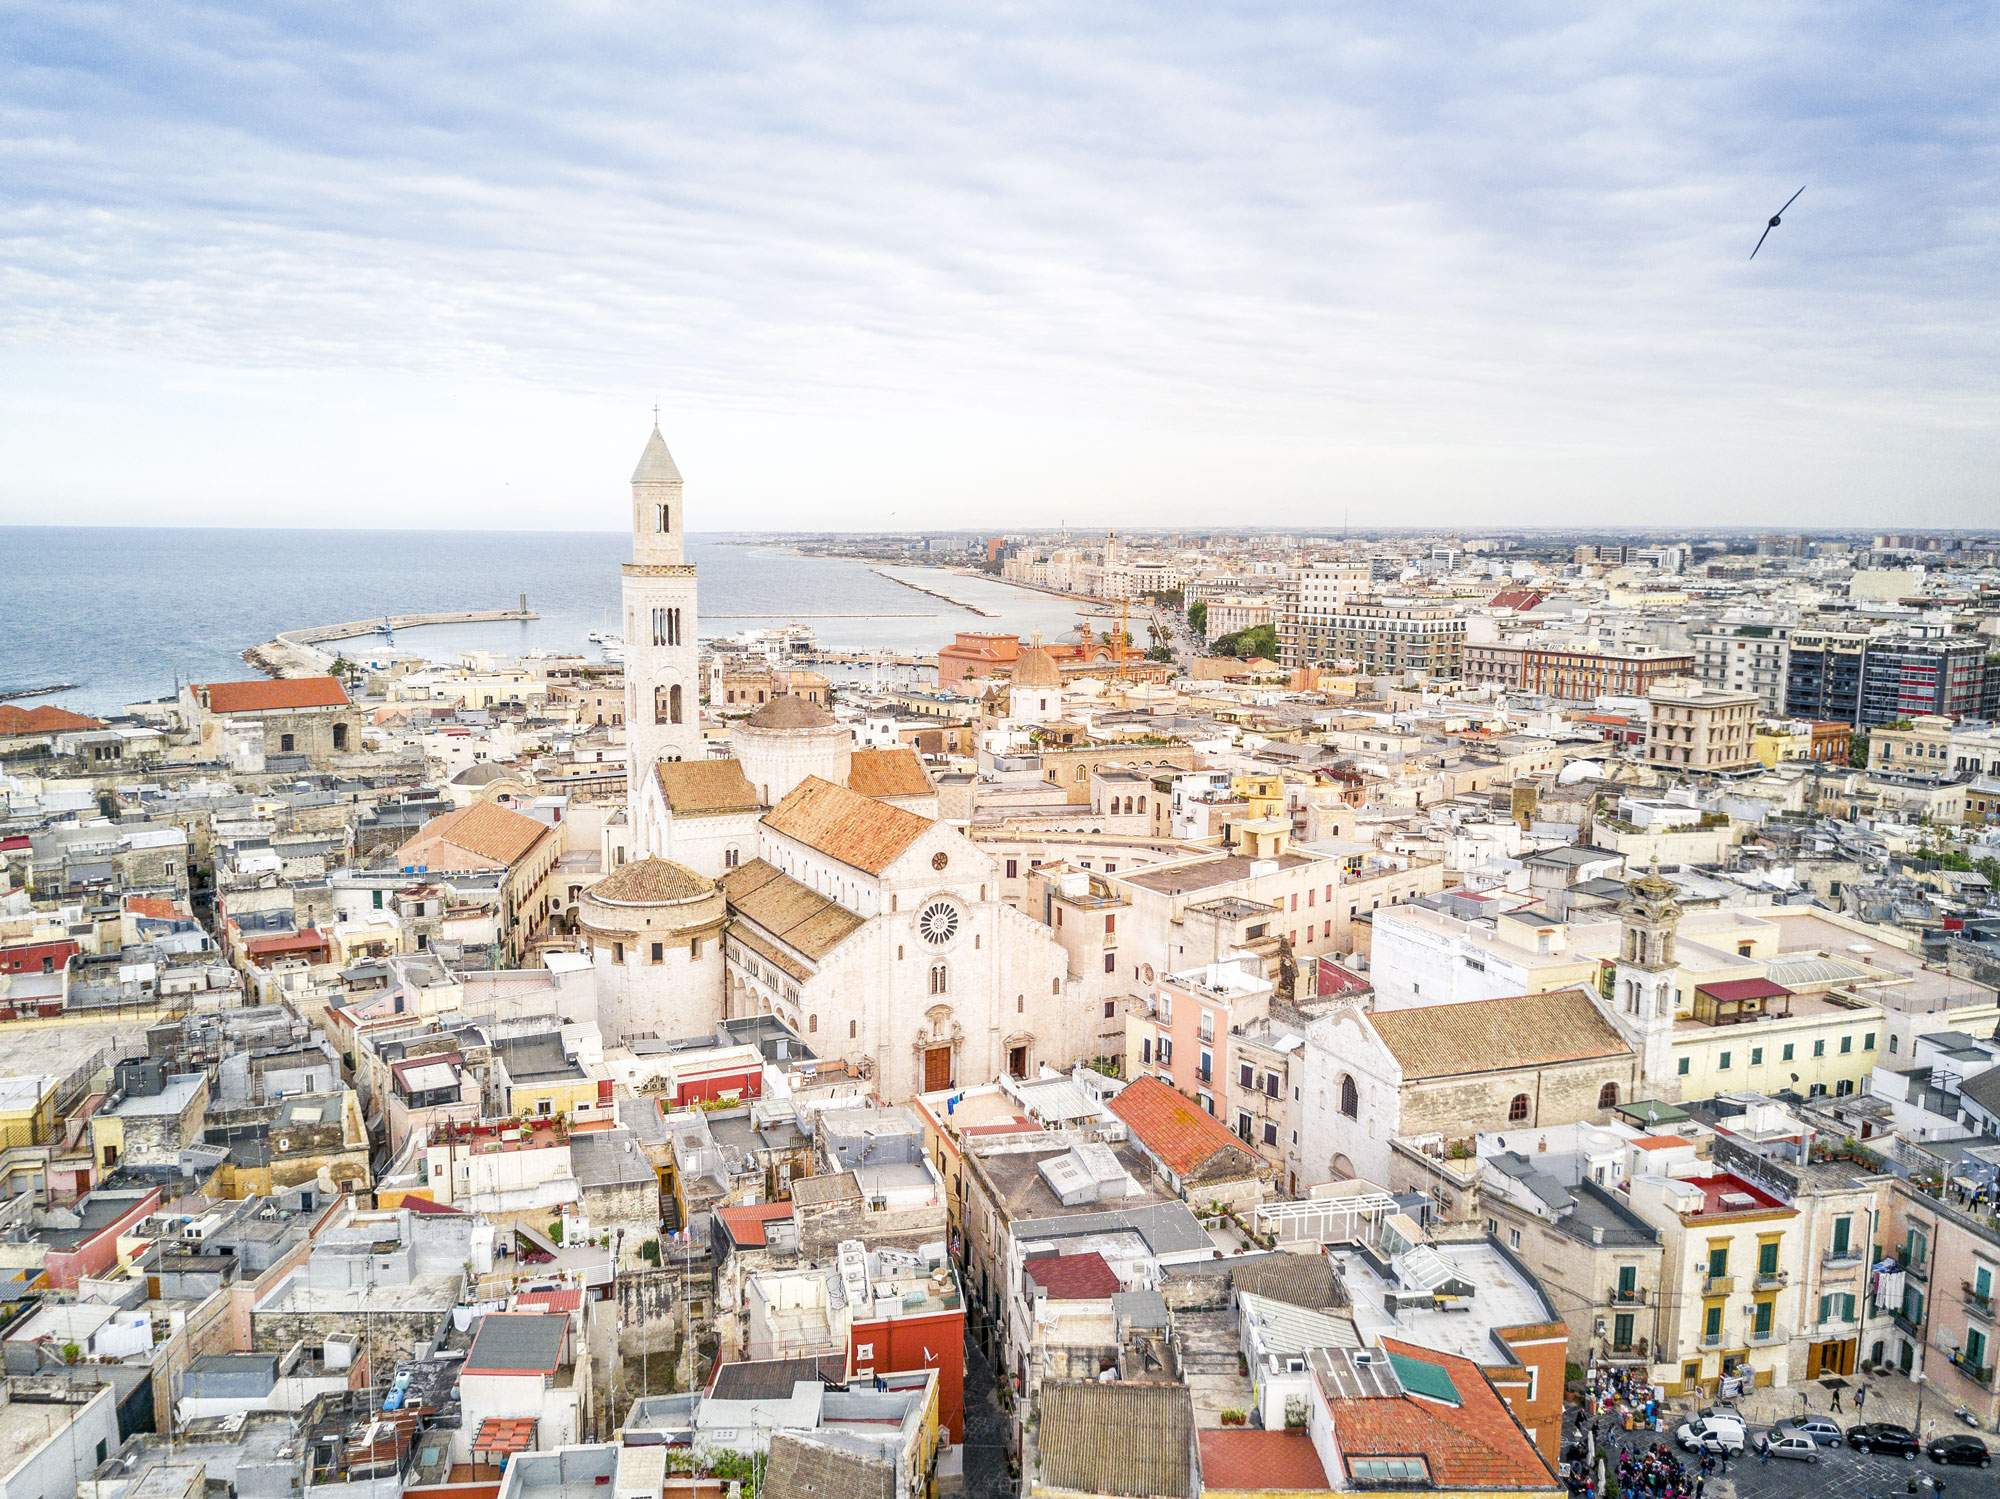 Bari, Puglia road trip itinerary